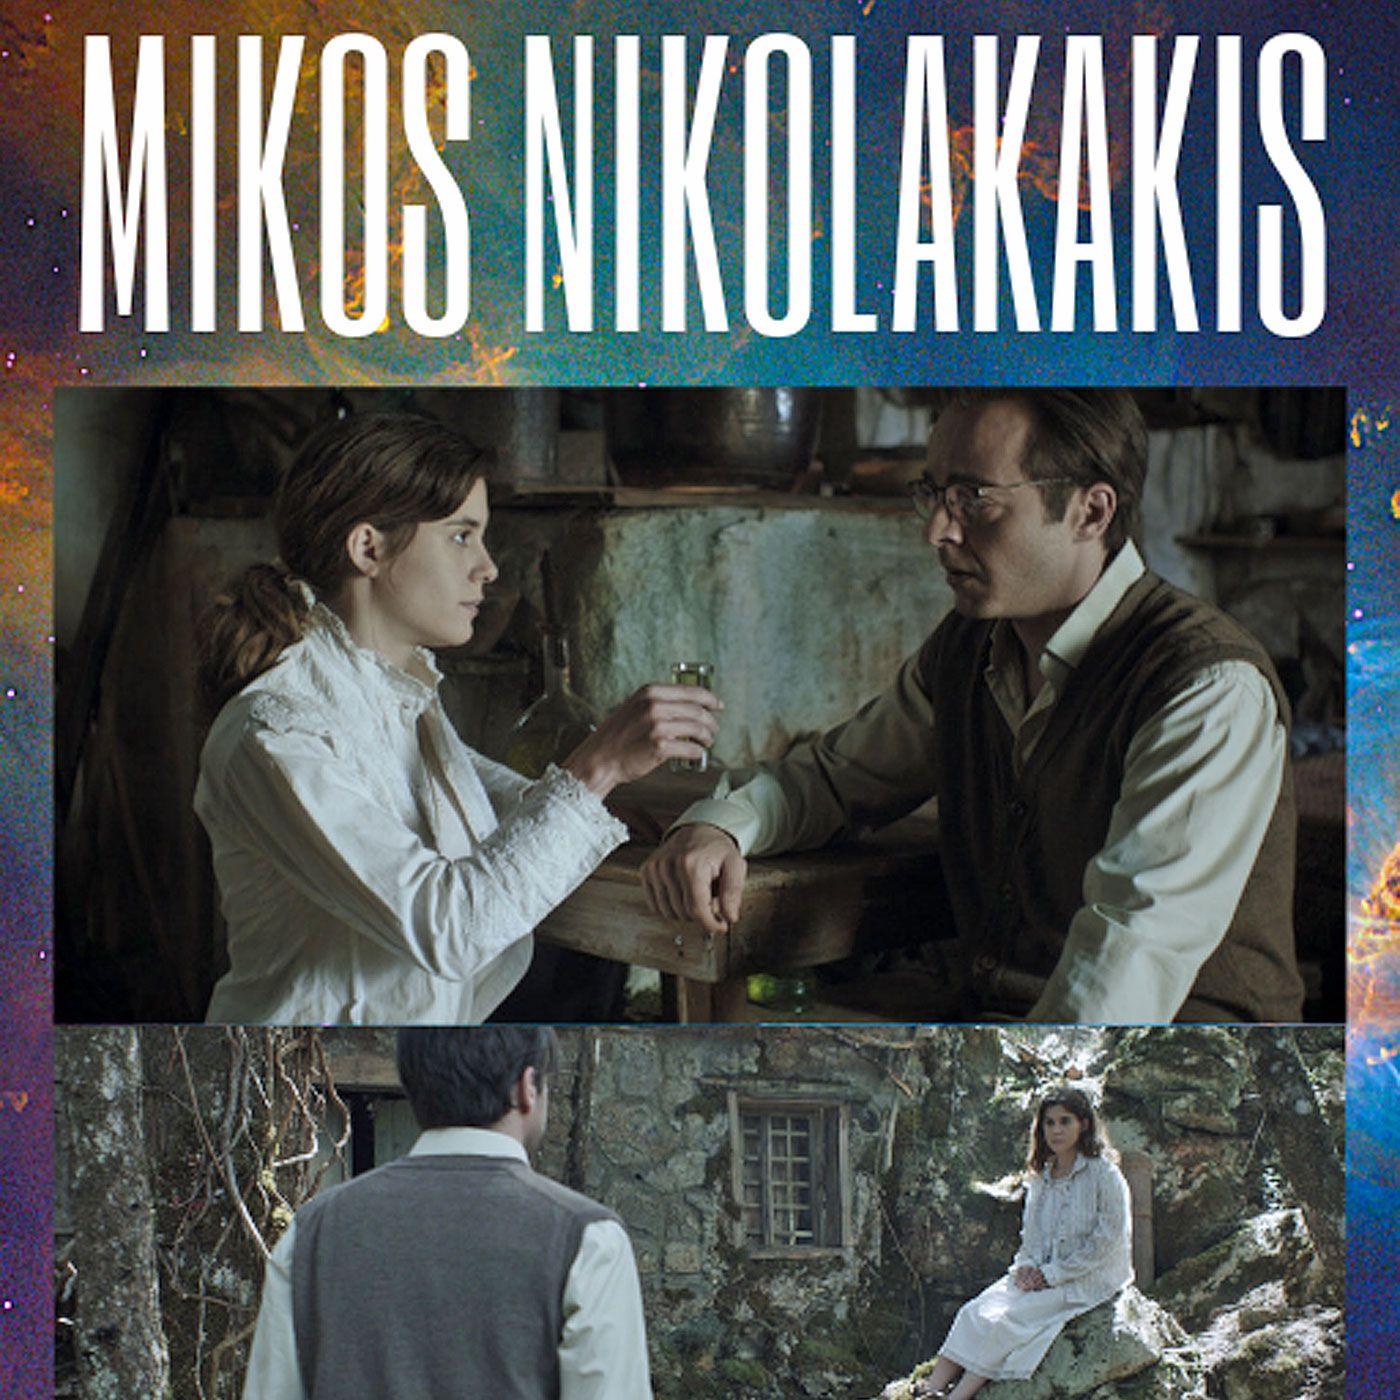 Mikos Nikolakakis